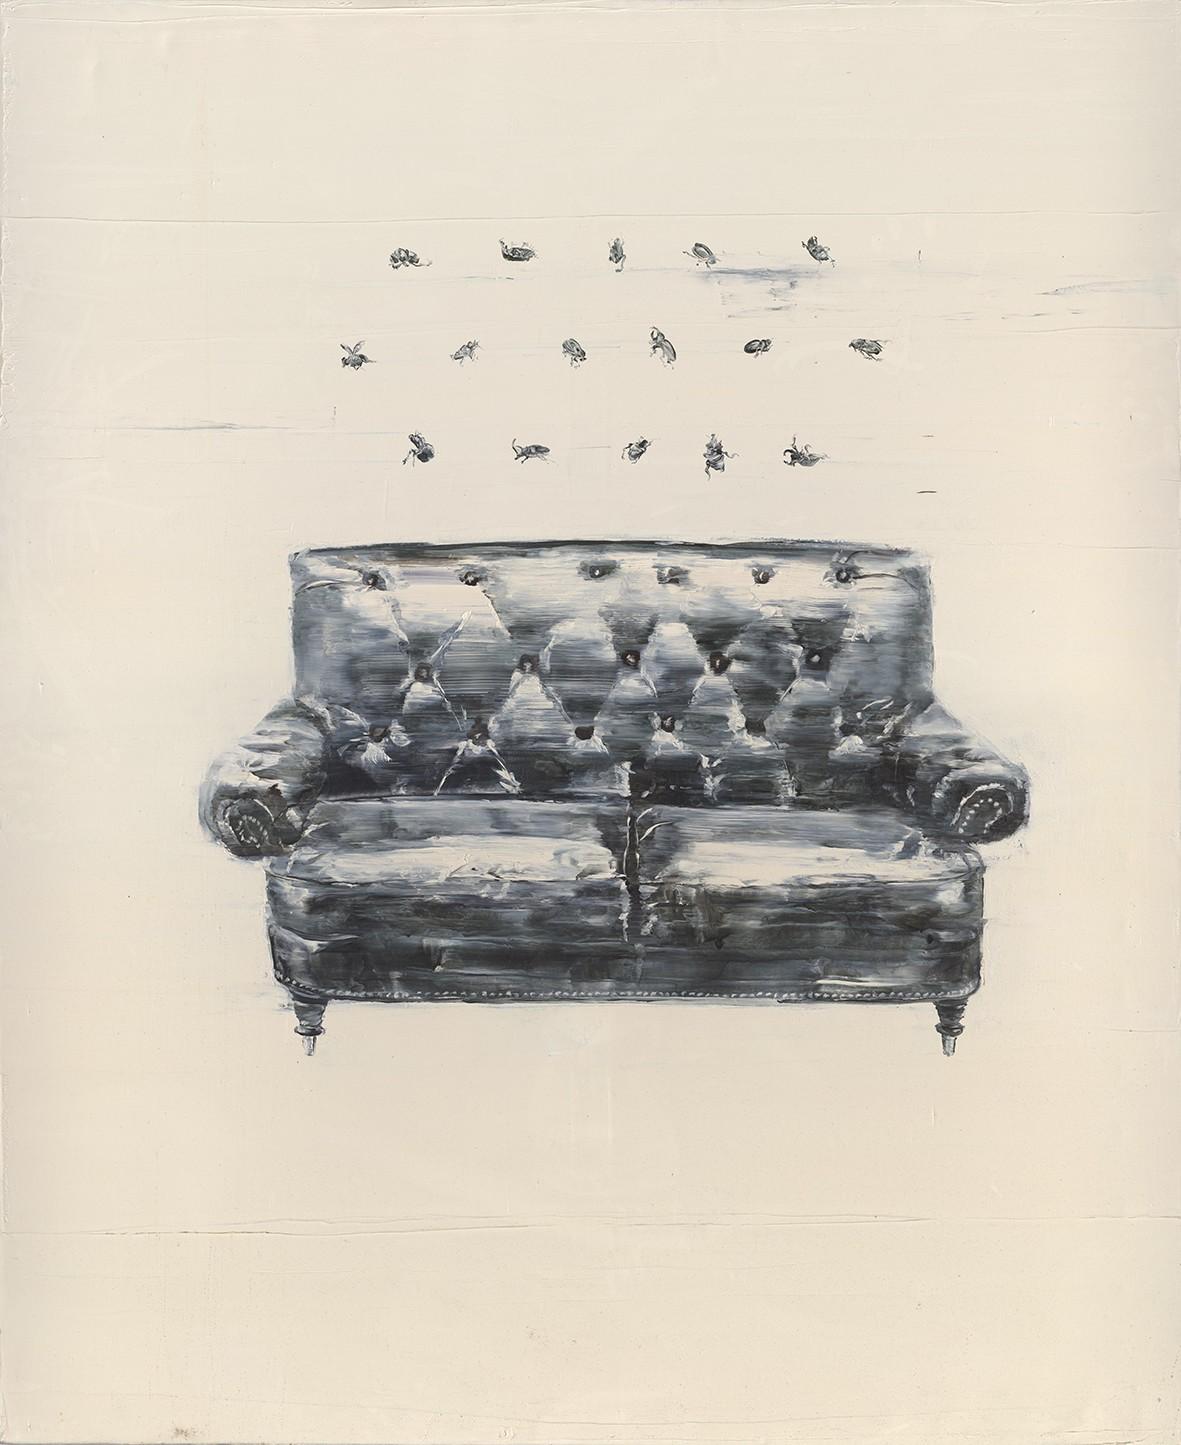 Tu Xi 涂曦, Sofa and Beetles 沙发和甲虫, 2012, Oil on canvas 布面油画, 180 x 150 cm